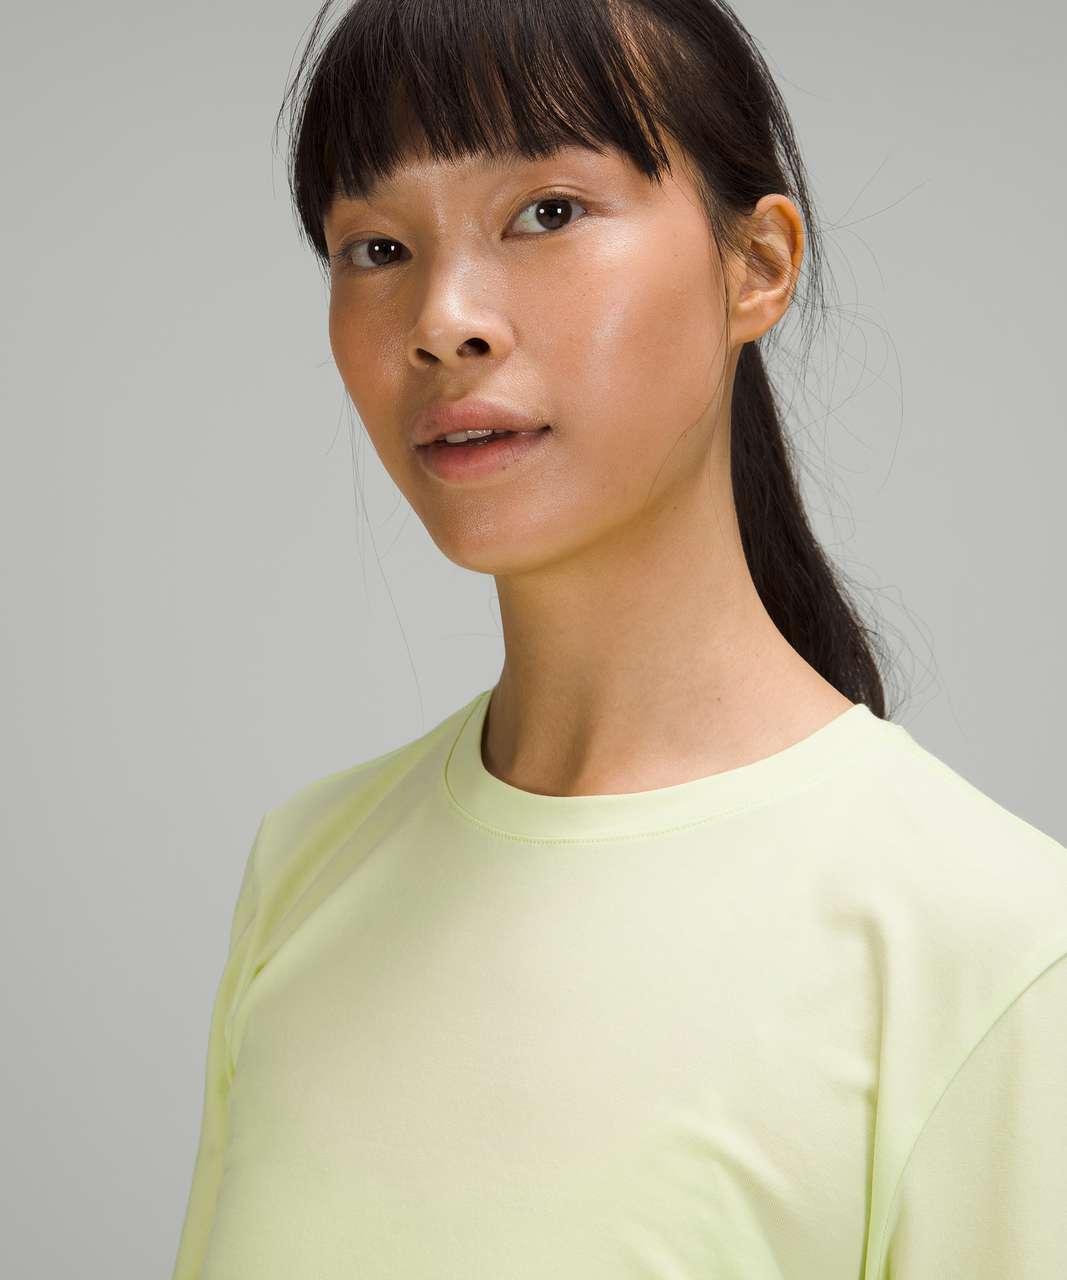 Lululemon Love Long Sleeve - Crispin Green